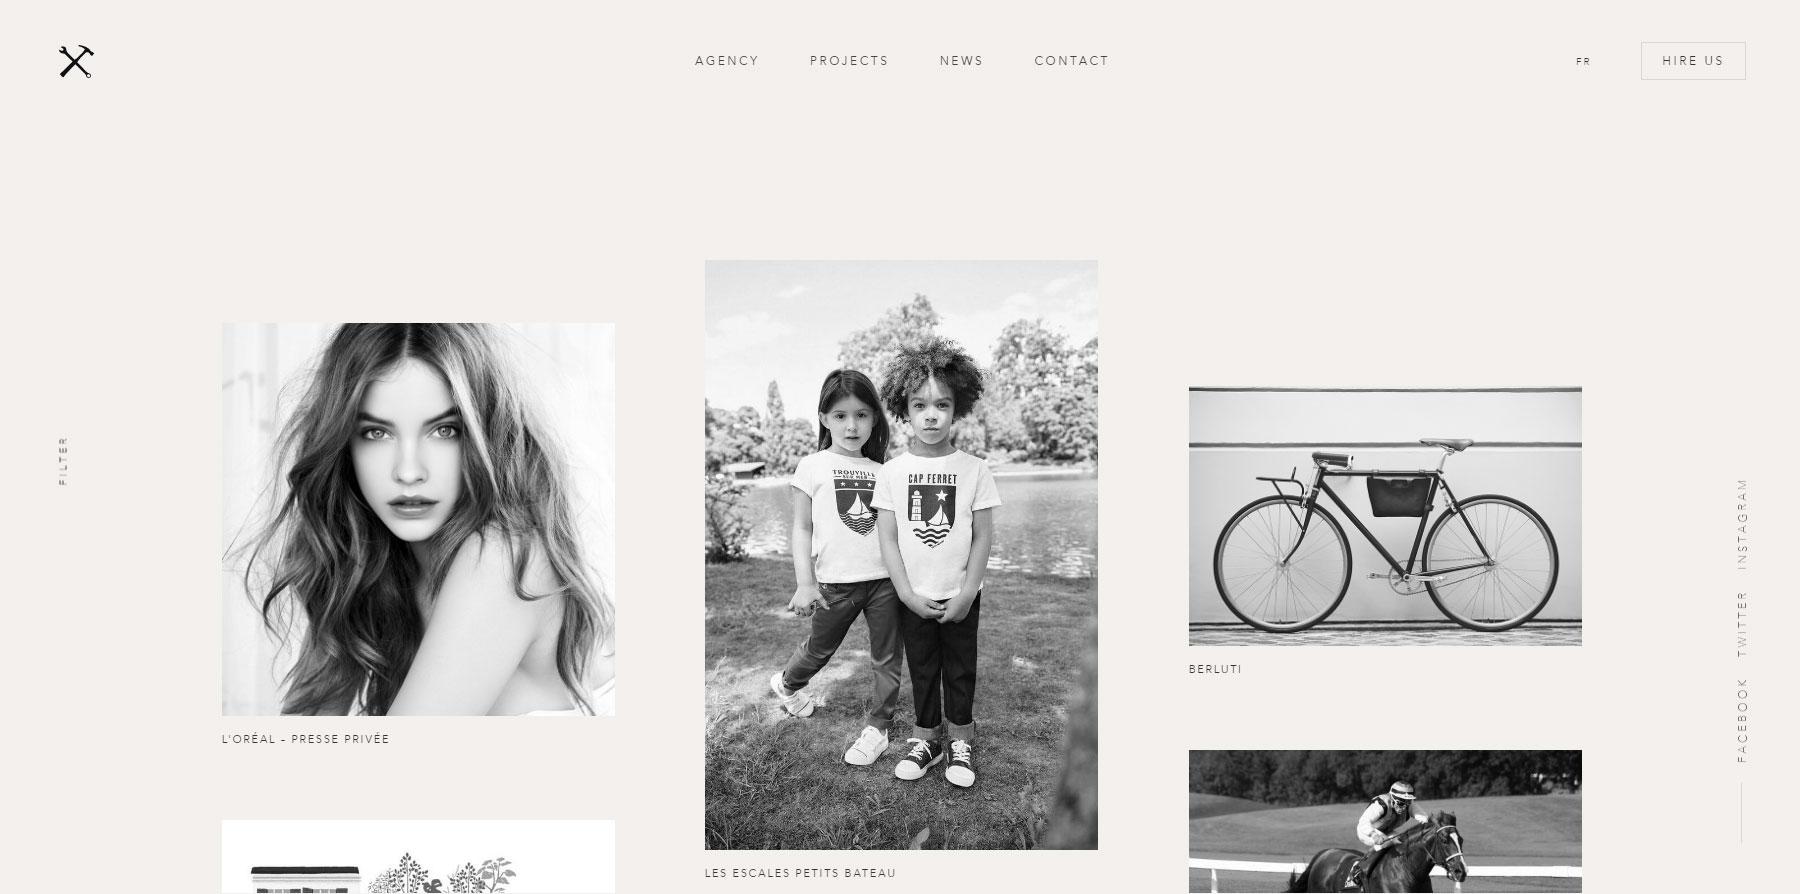 Belle Epoque - Website of the Day